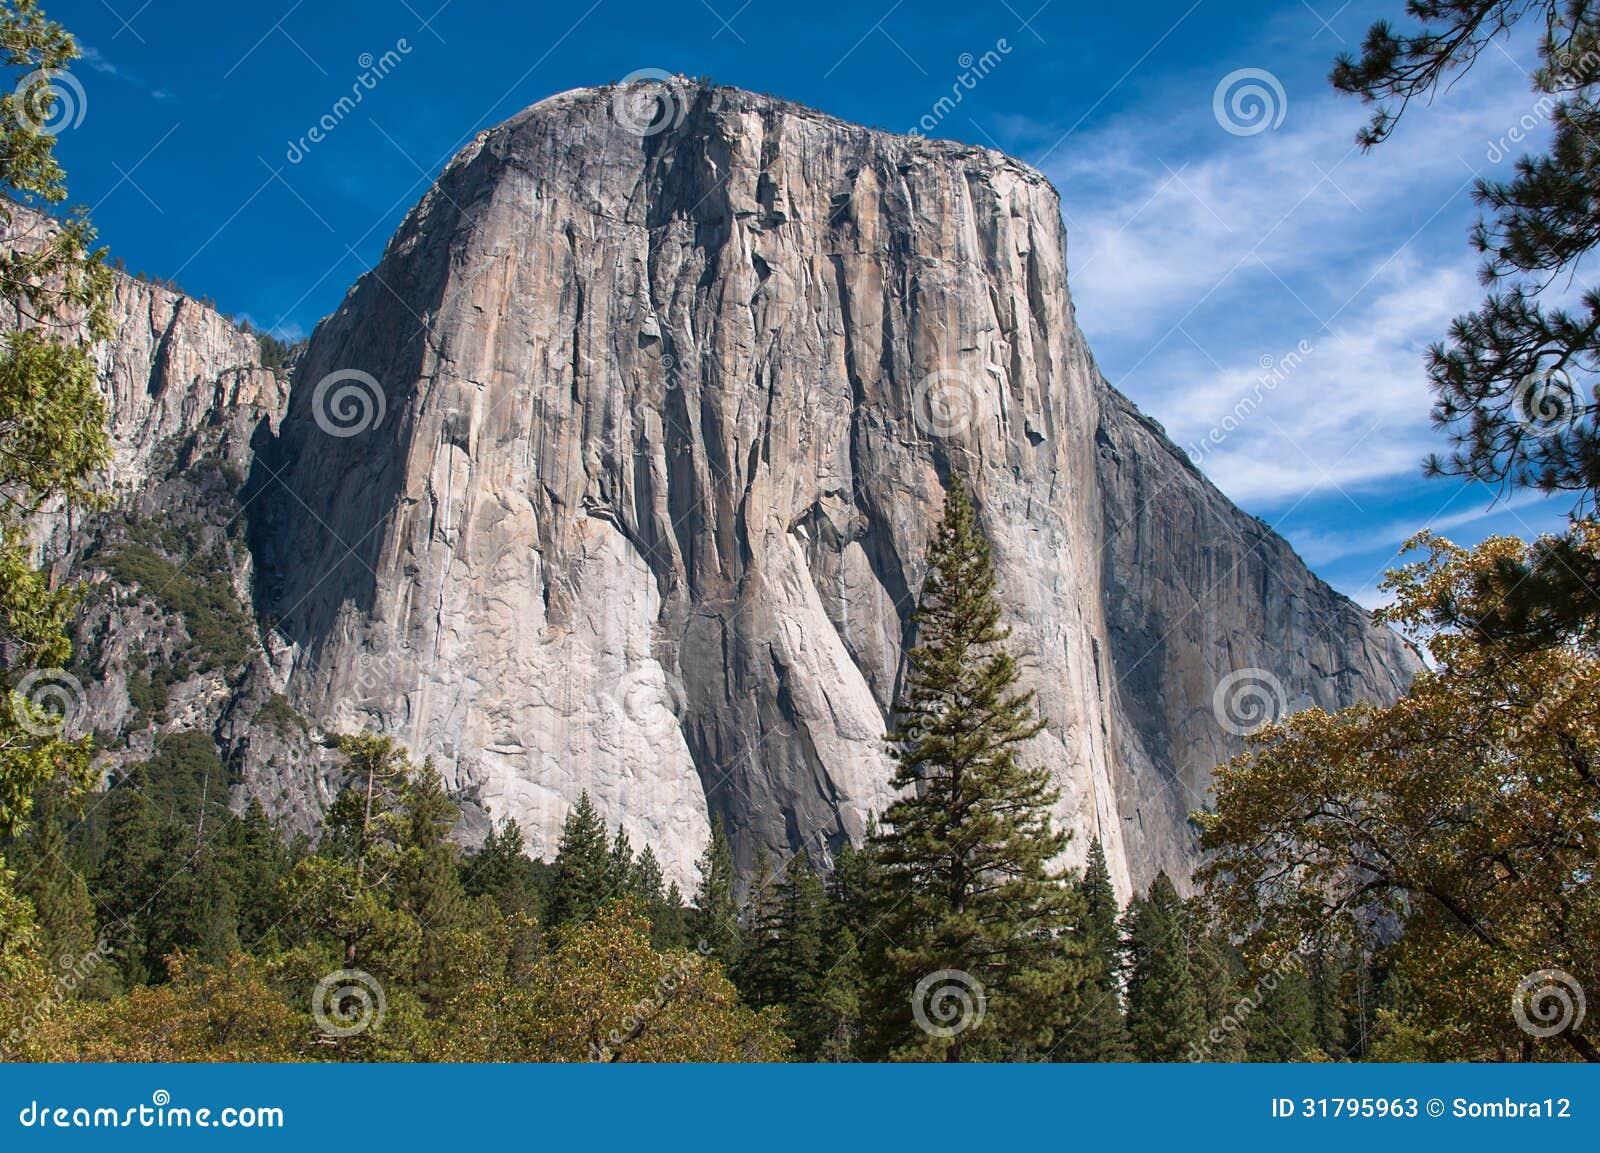 El Capitan A Rock In Yosemite National Park Stock Photos